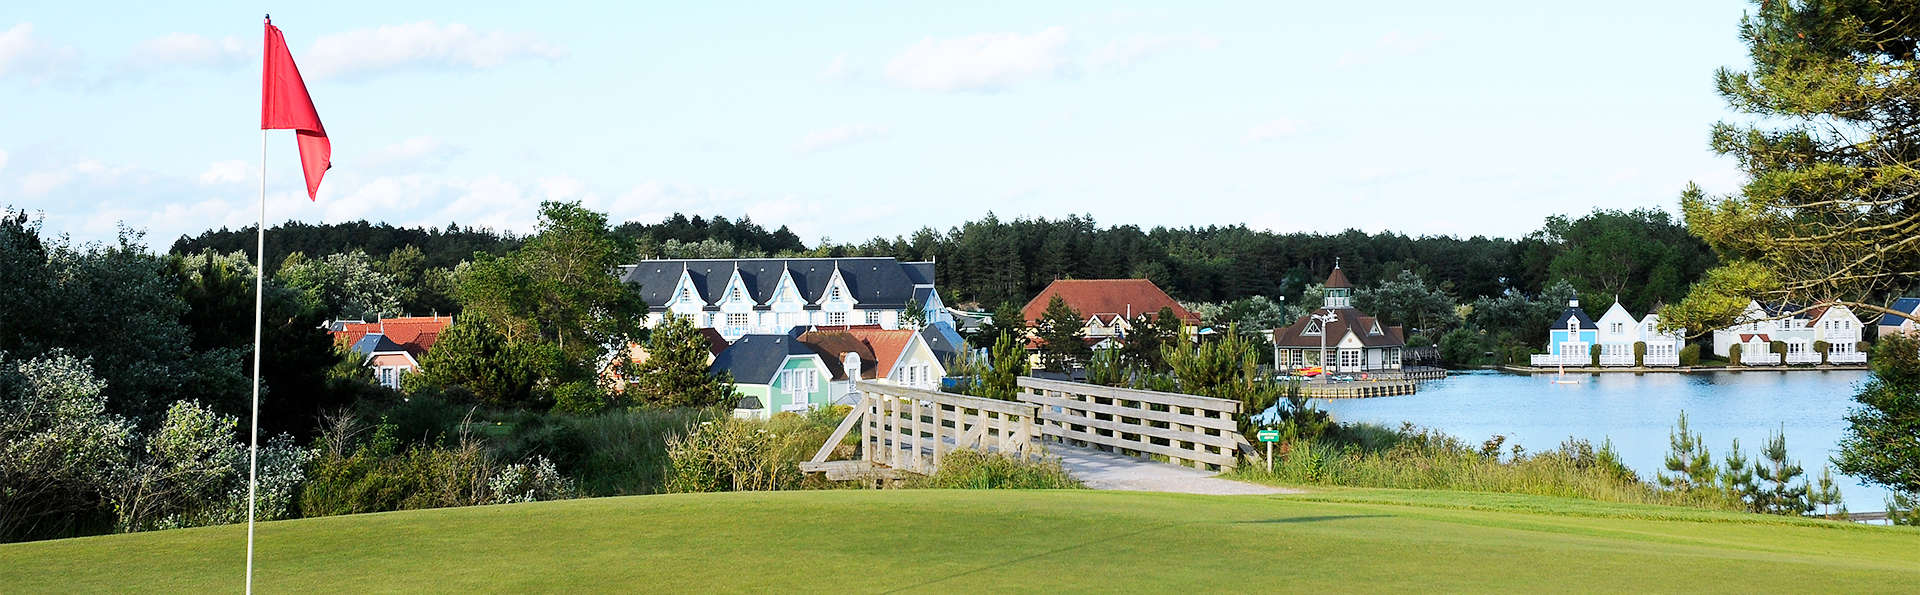 Pierre et Vacances Village Belle Dune - EDIT_golf.jpg